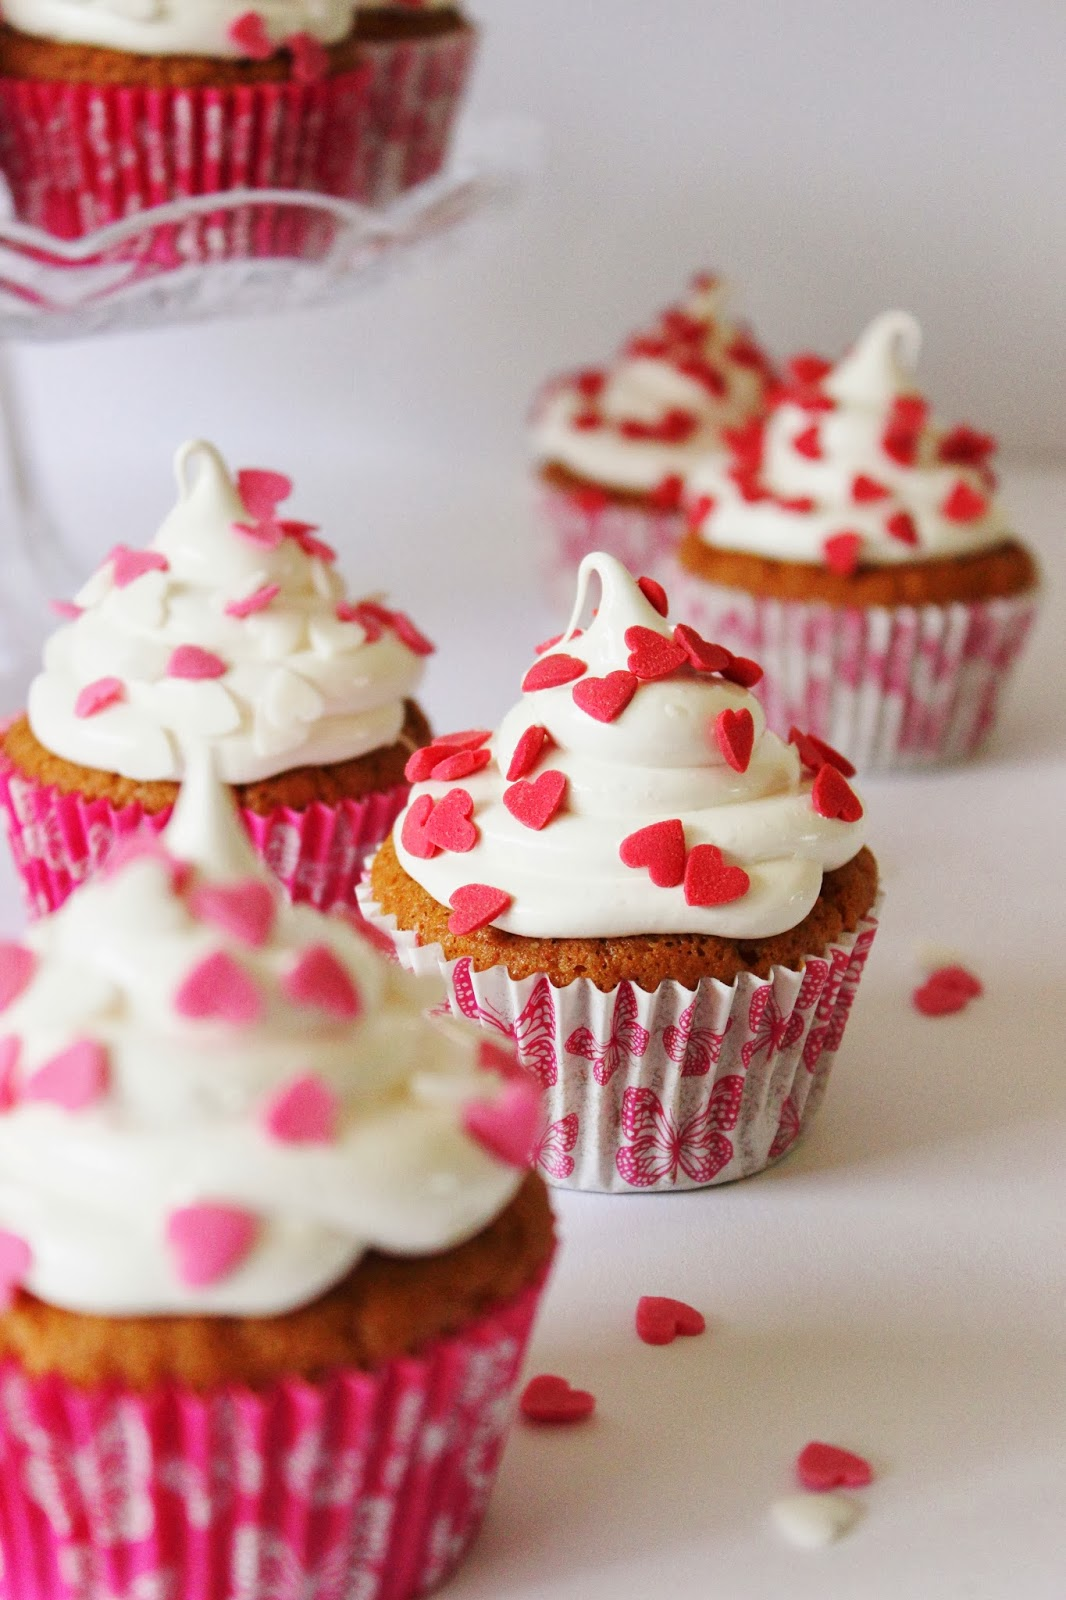 Liefdescakejes / Valentijnscakejes